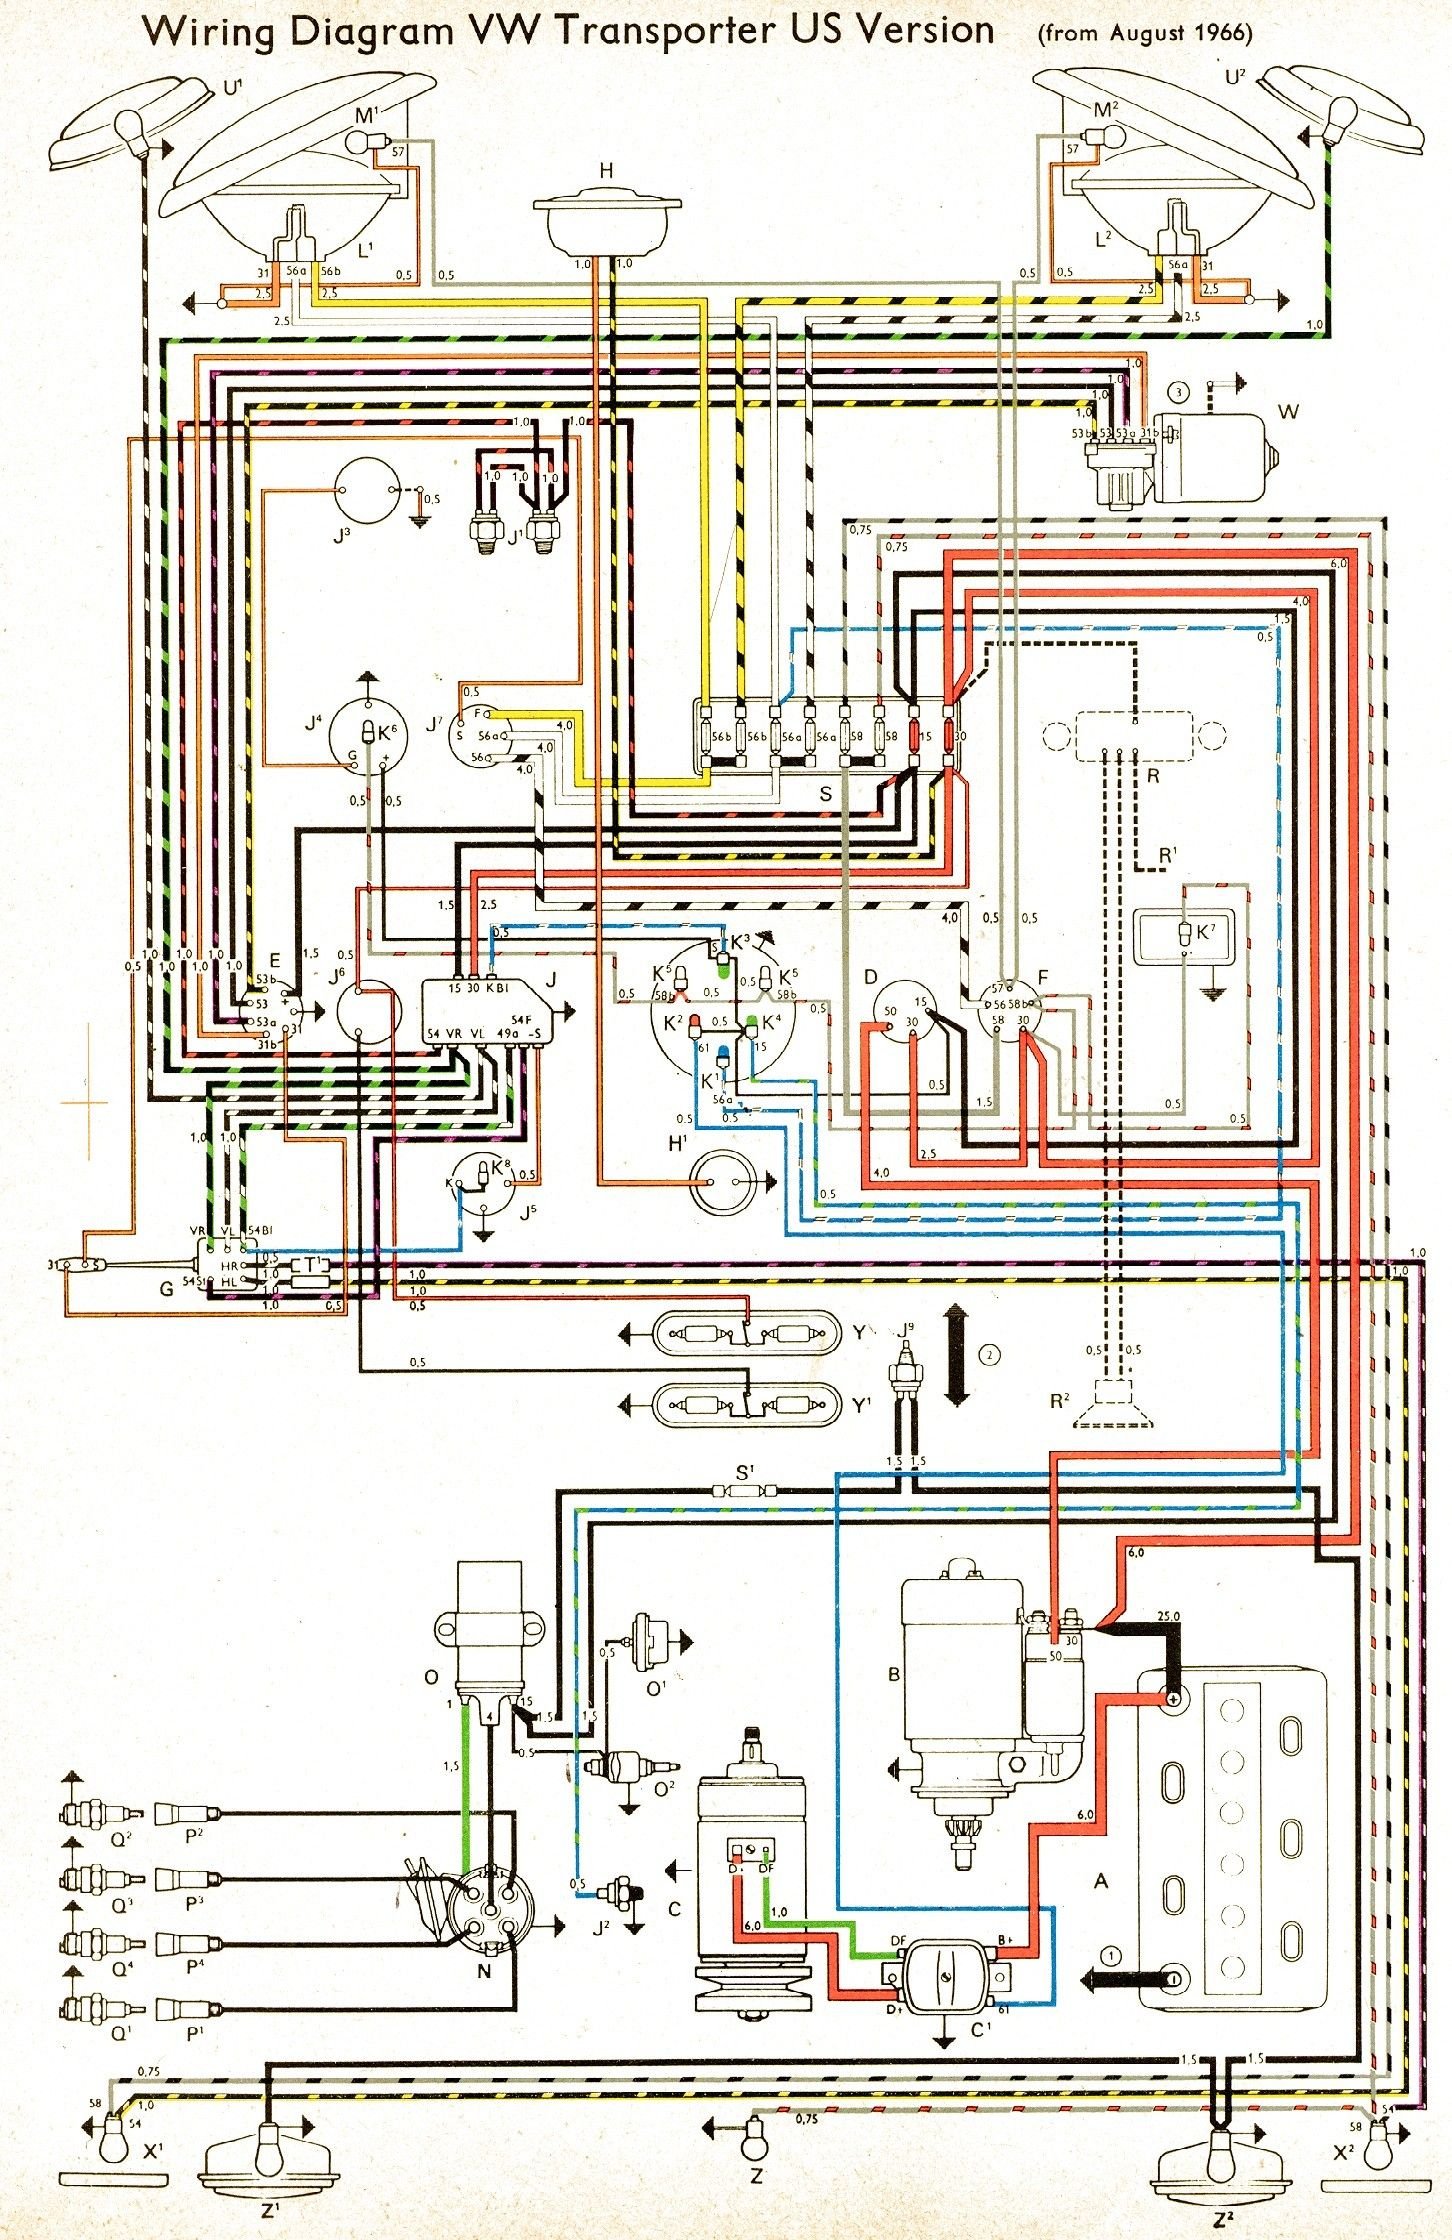 New How To Read Circuit Diagrams Diagram Wiringdiagram Diagramming Diagramm Visuals Visuali Circuit Diagram Electrical Circuit Diagram Electrical Diagram